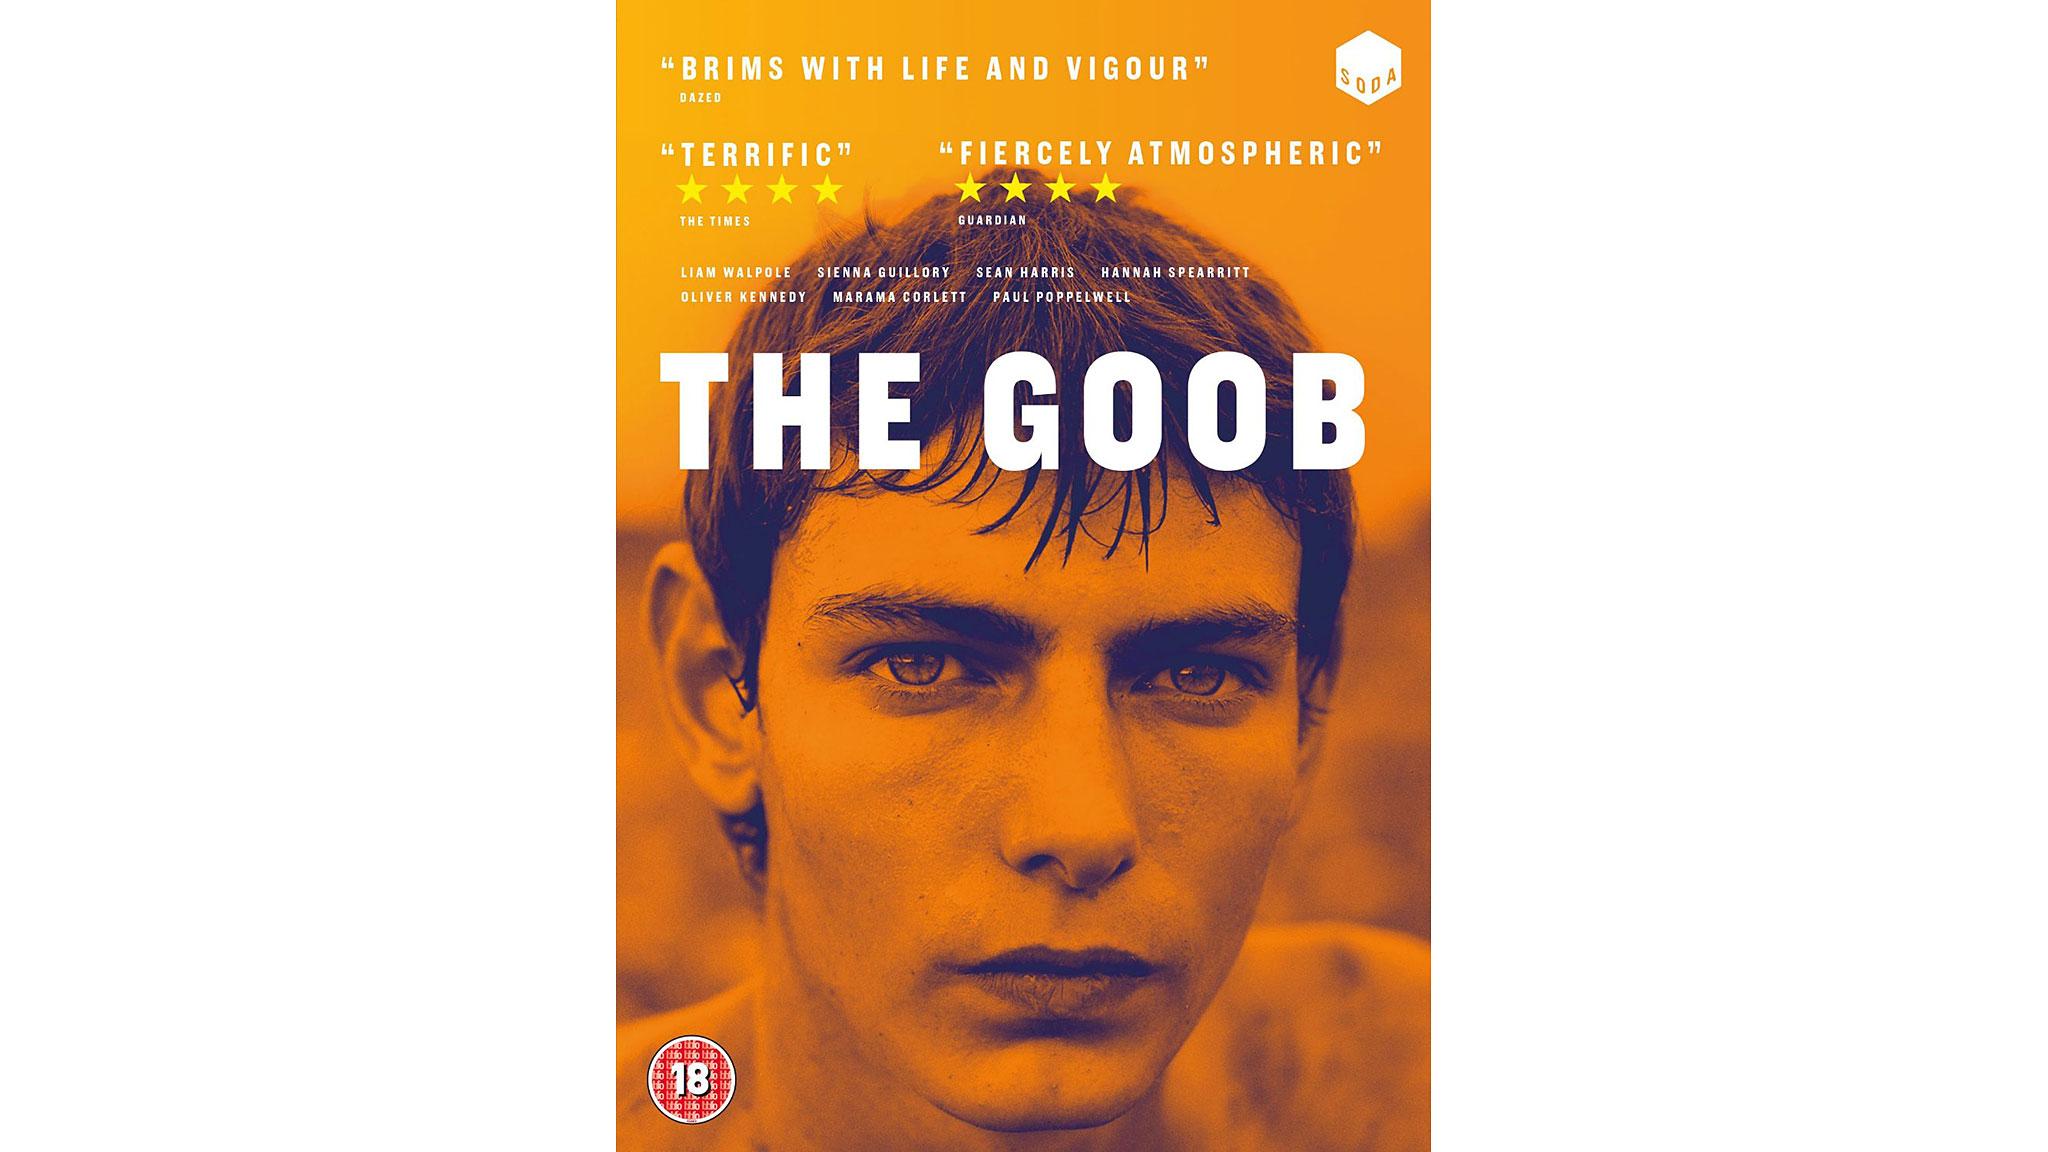 the goob movie